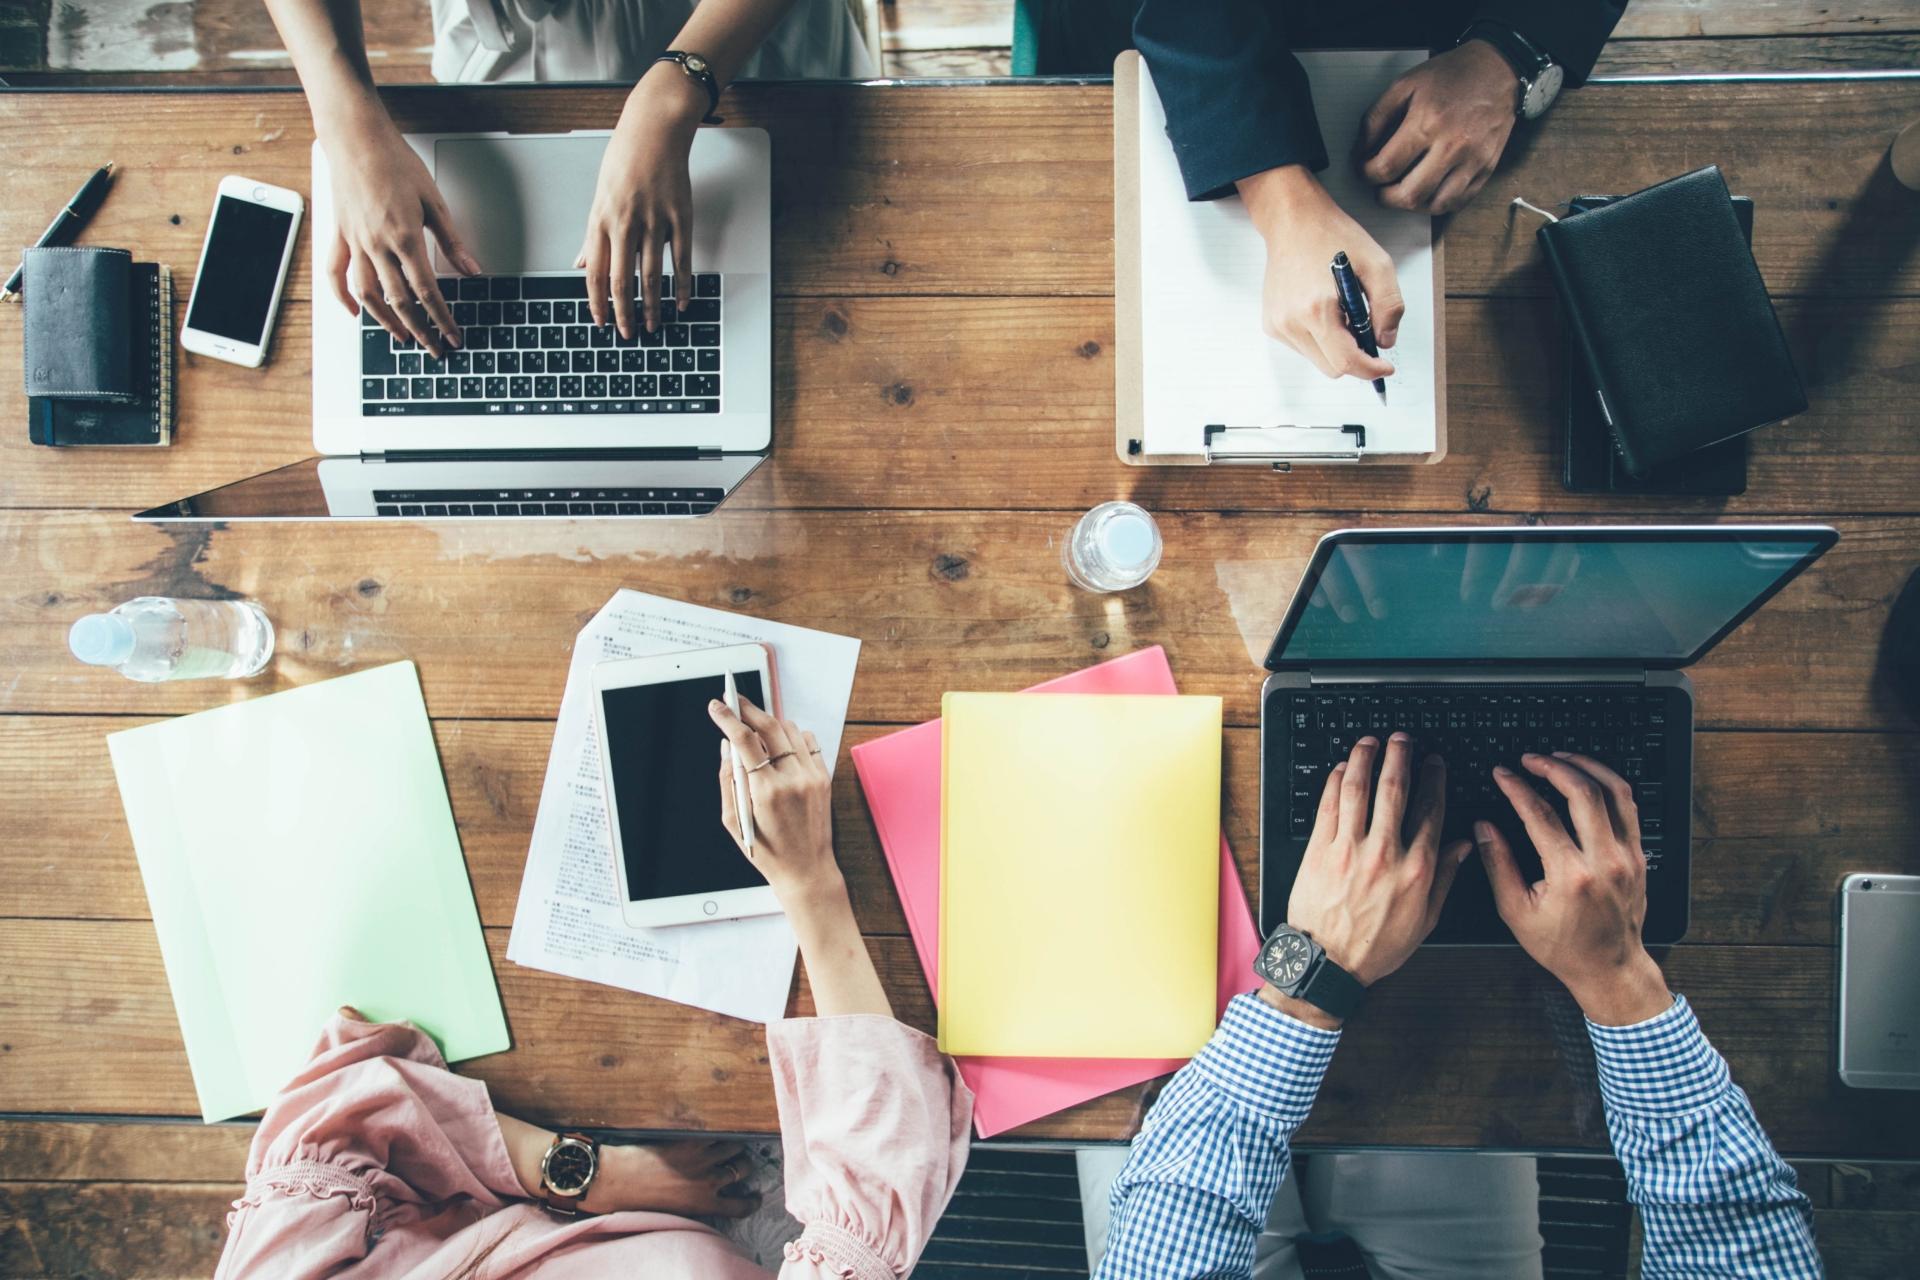 【WEBマーケティング事業】おしゃれなワードプレスWEBサイトを3時間で作れるようになるワークショップ講座